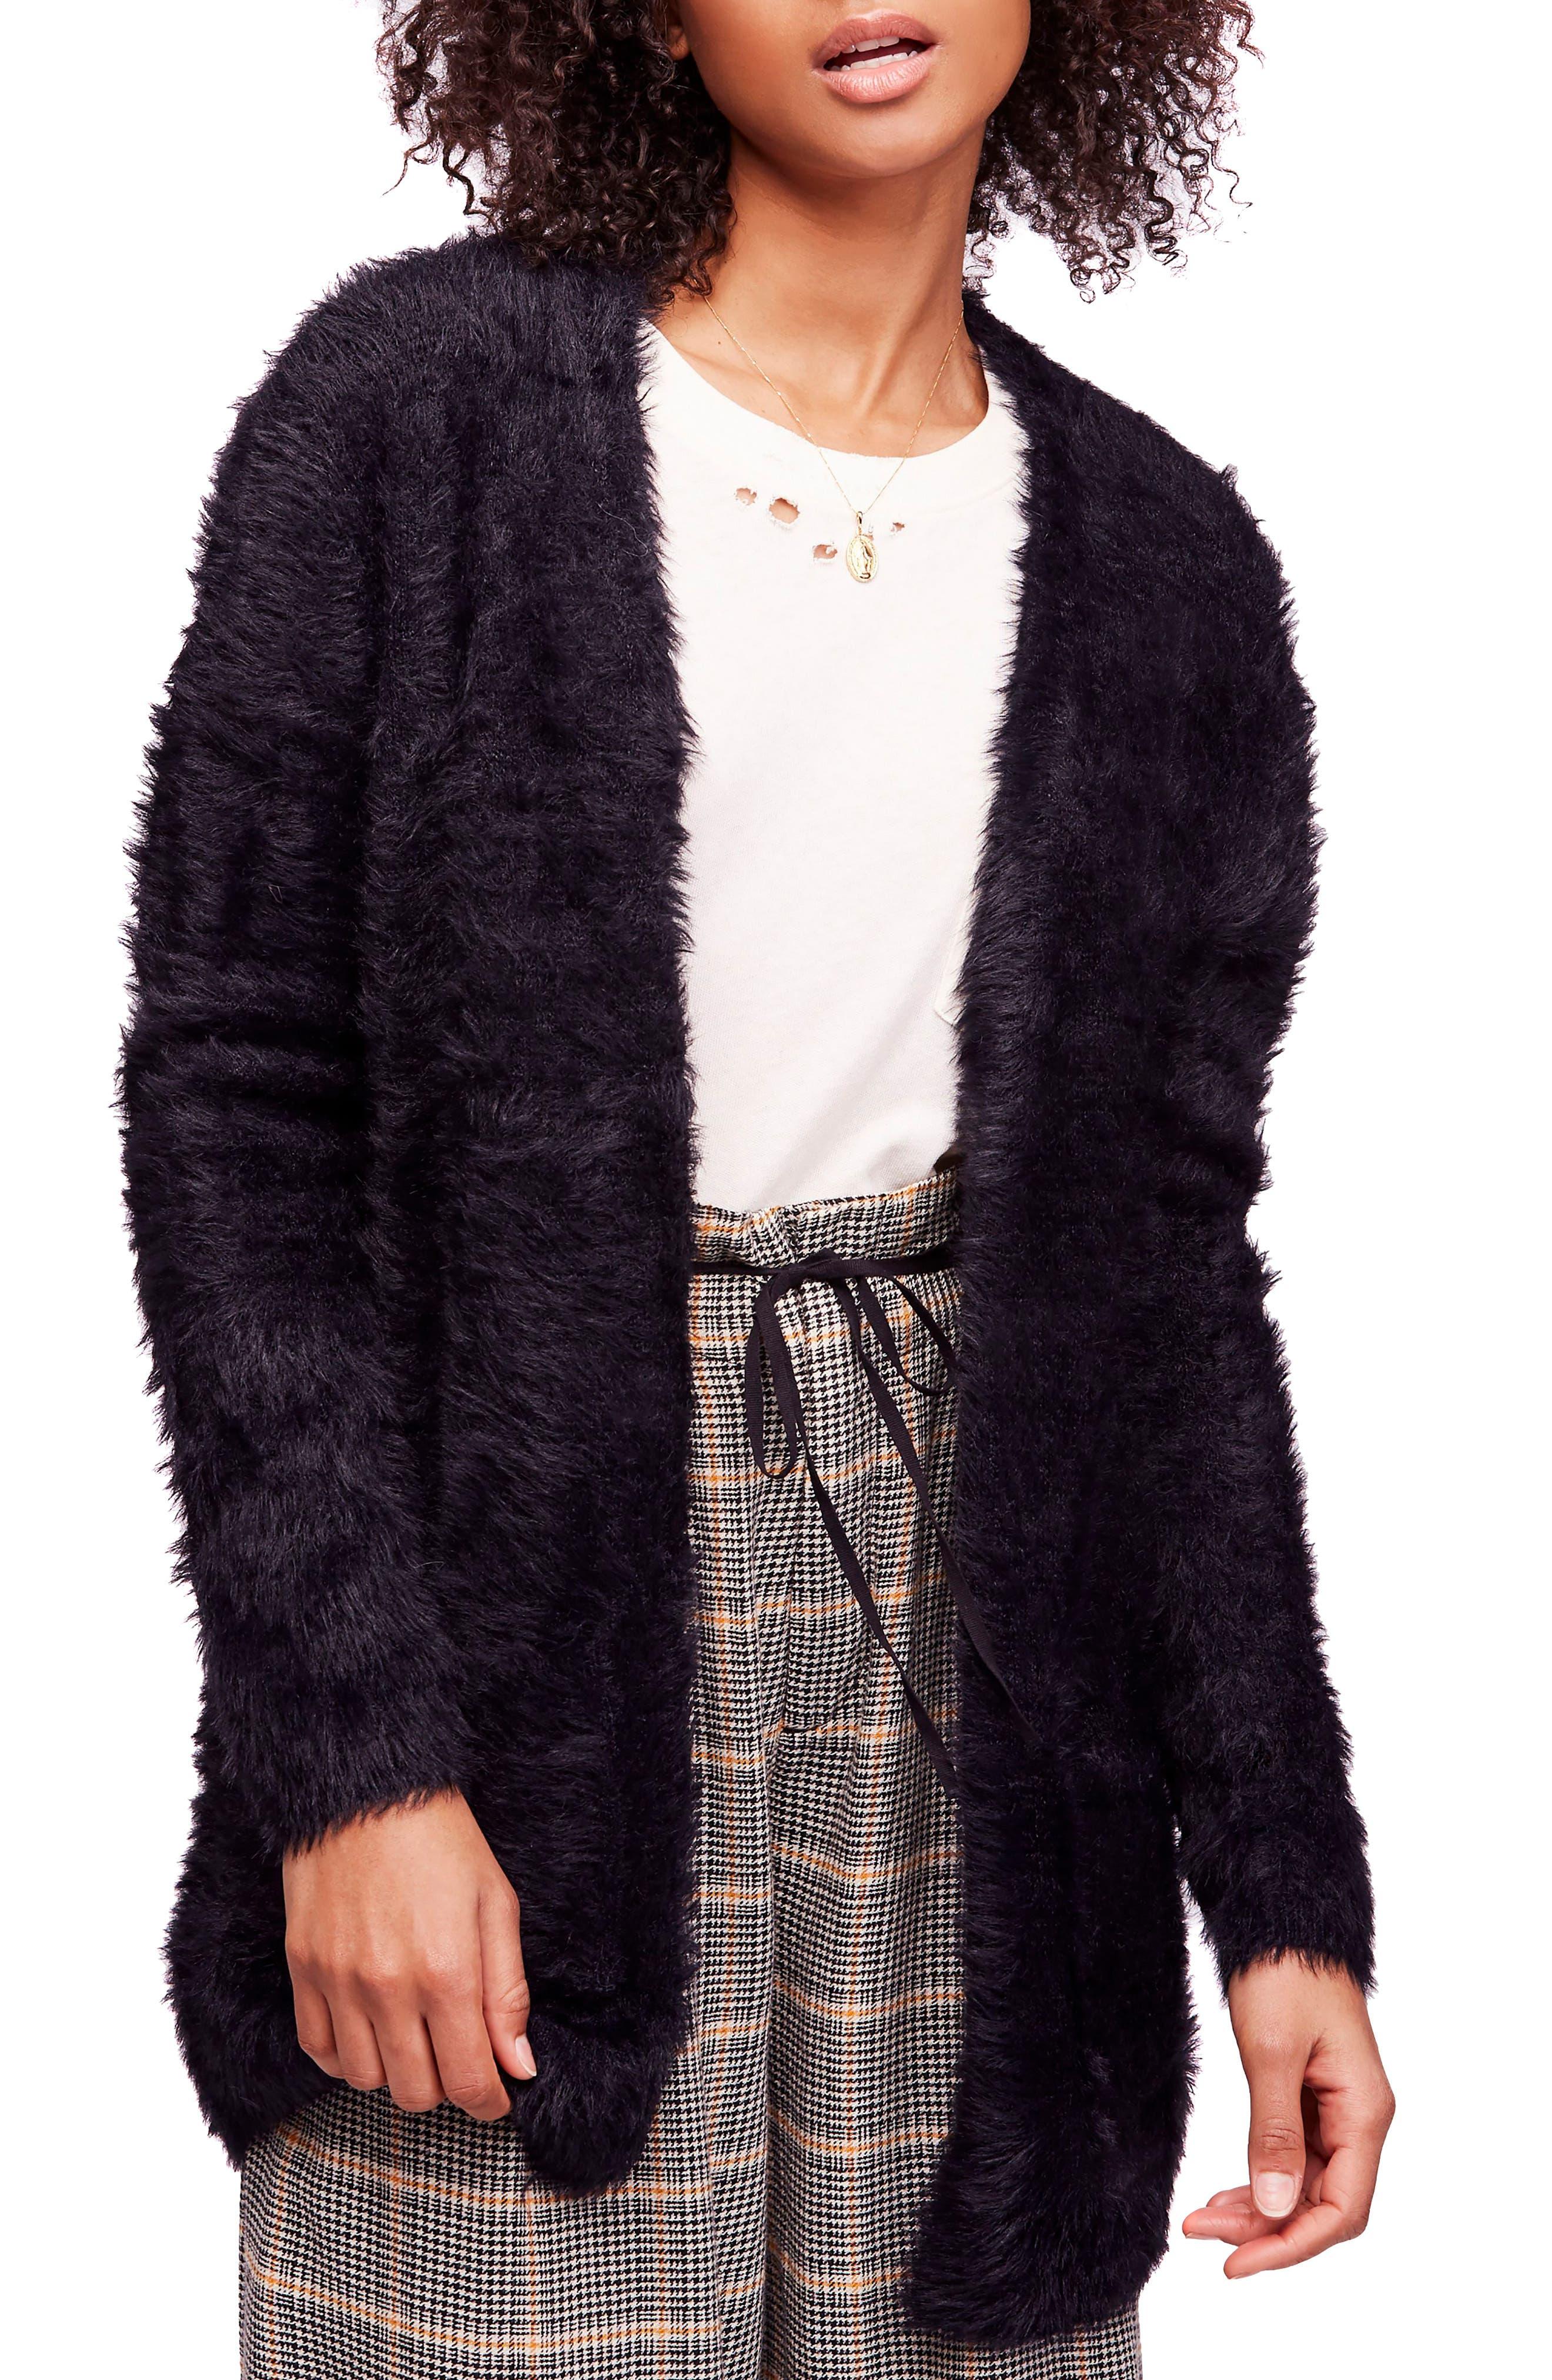 FREE PEOPLE Faux Fur Cardigan, Main, color, 001